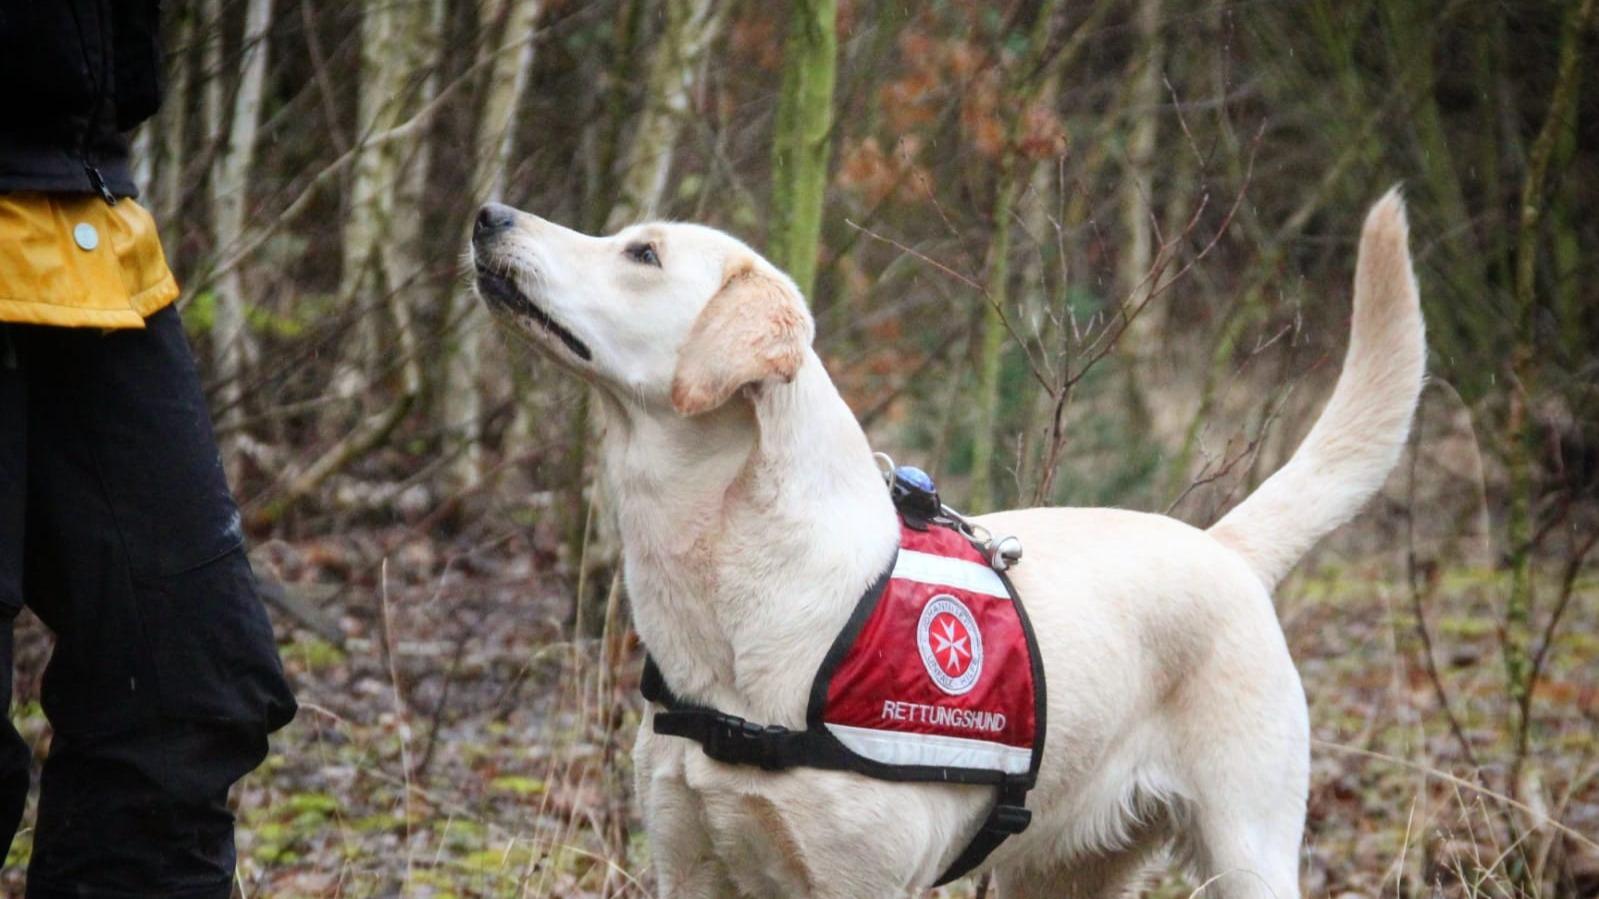 Rettungshund Hundezucht Bürger